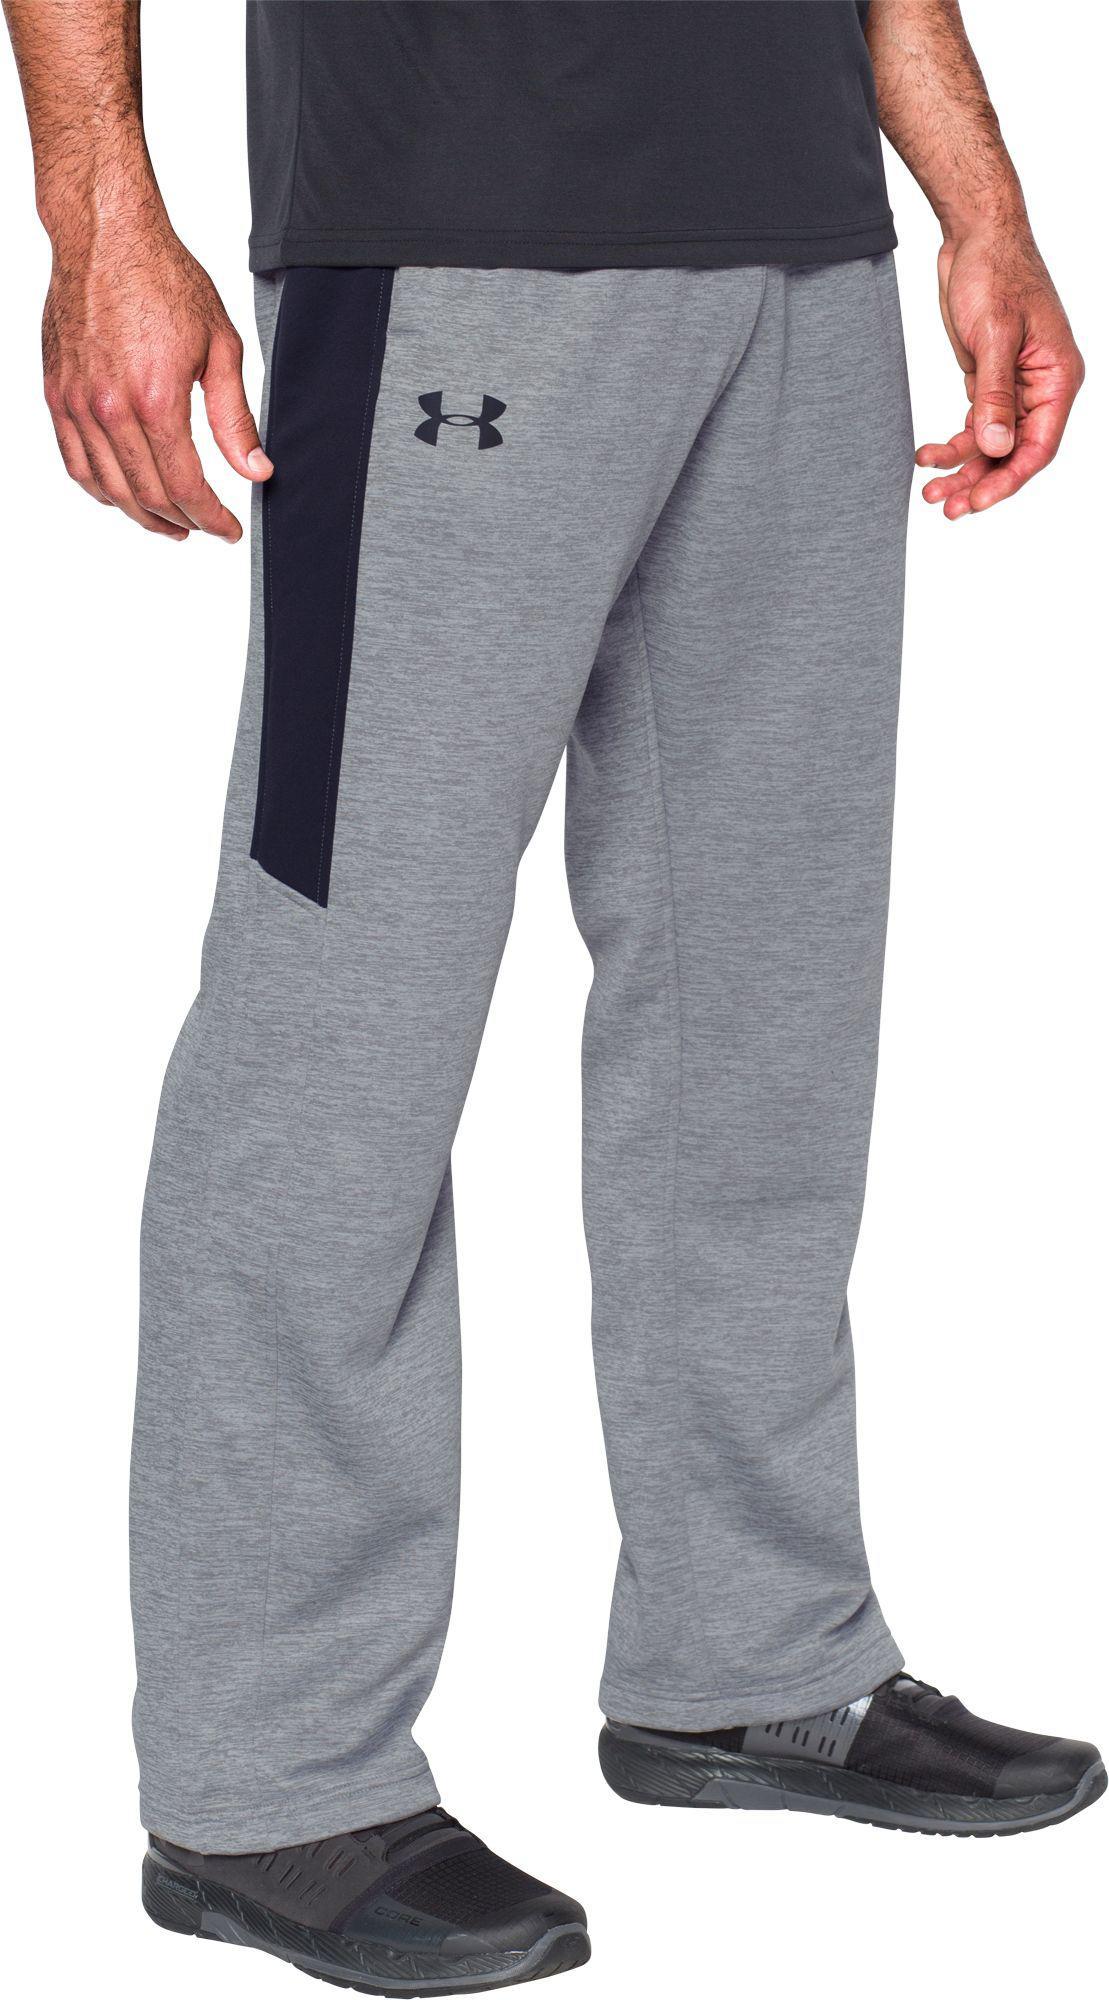 ecbce05d8cc2 Lyst - Under Armour Storm Armour Fleece Pants in Black for Men